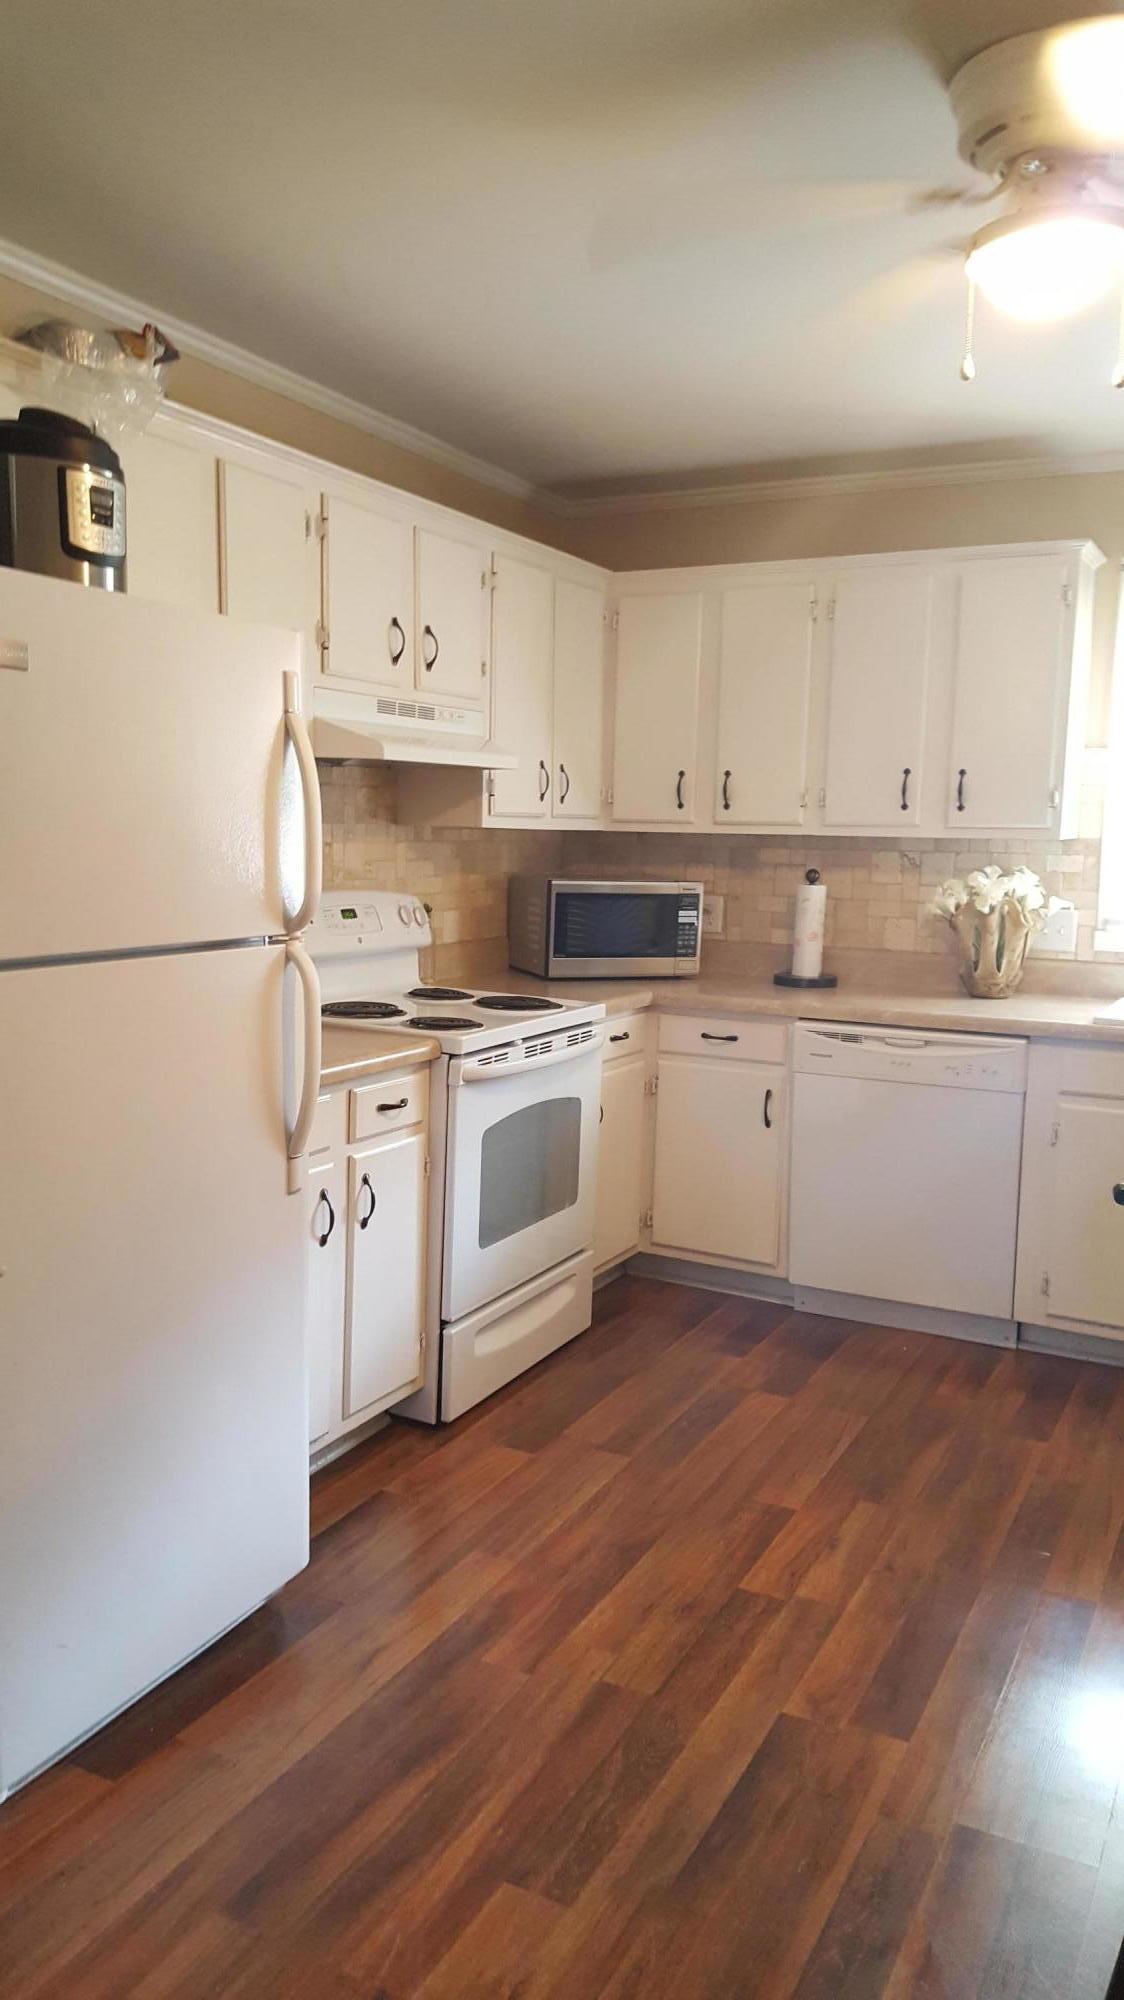 Pepperhill Homes For Sale - 7640 Hillandale, North Charleston, SC - 12